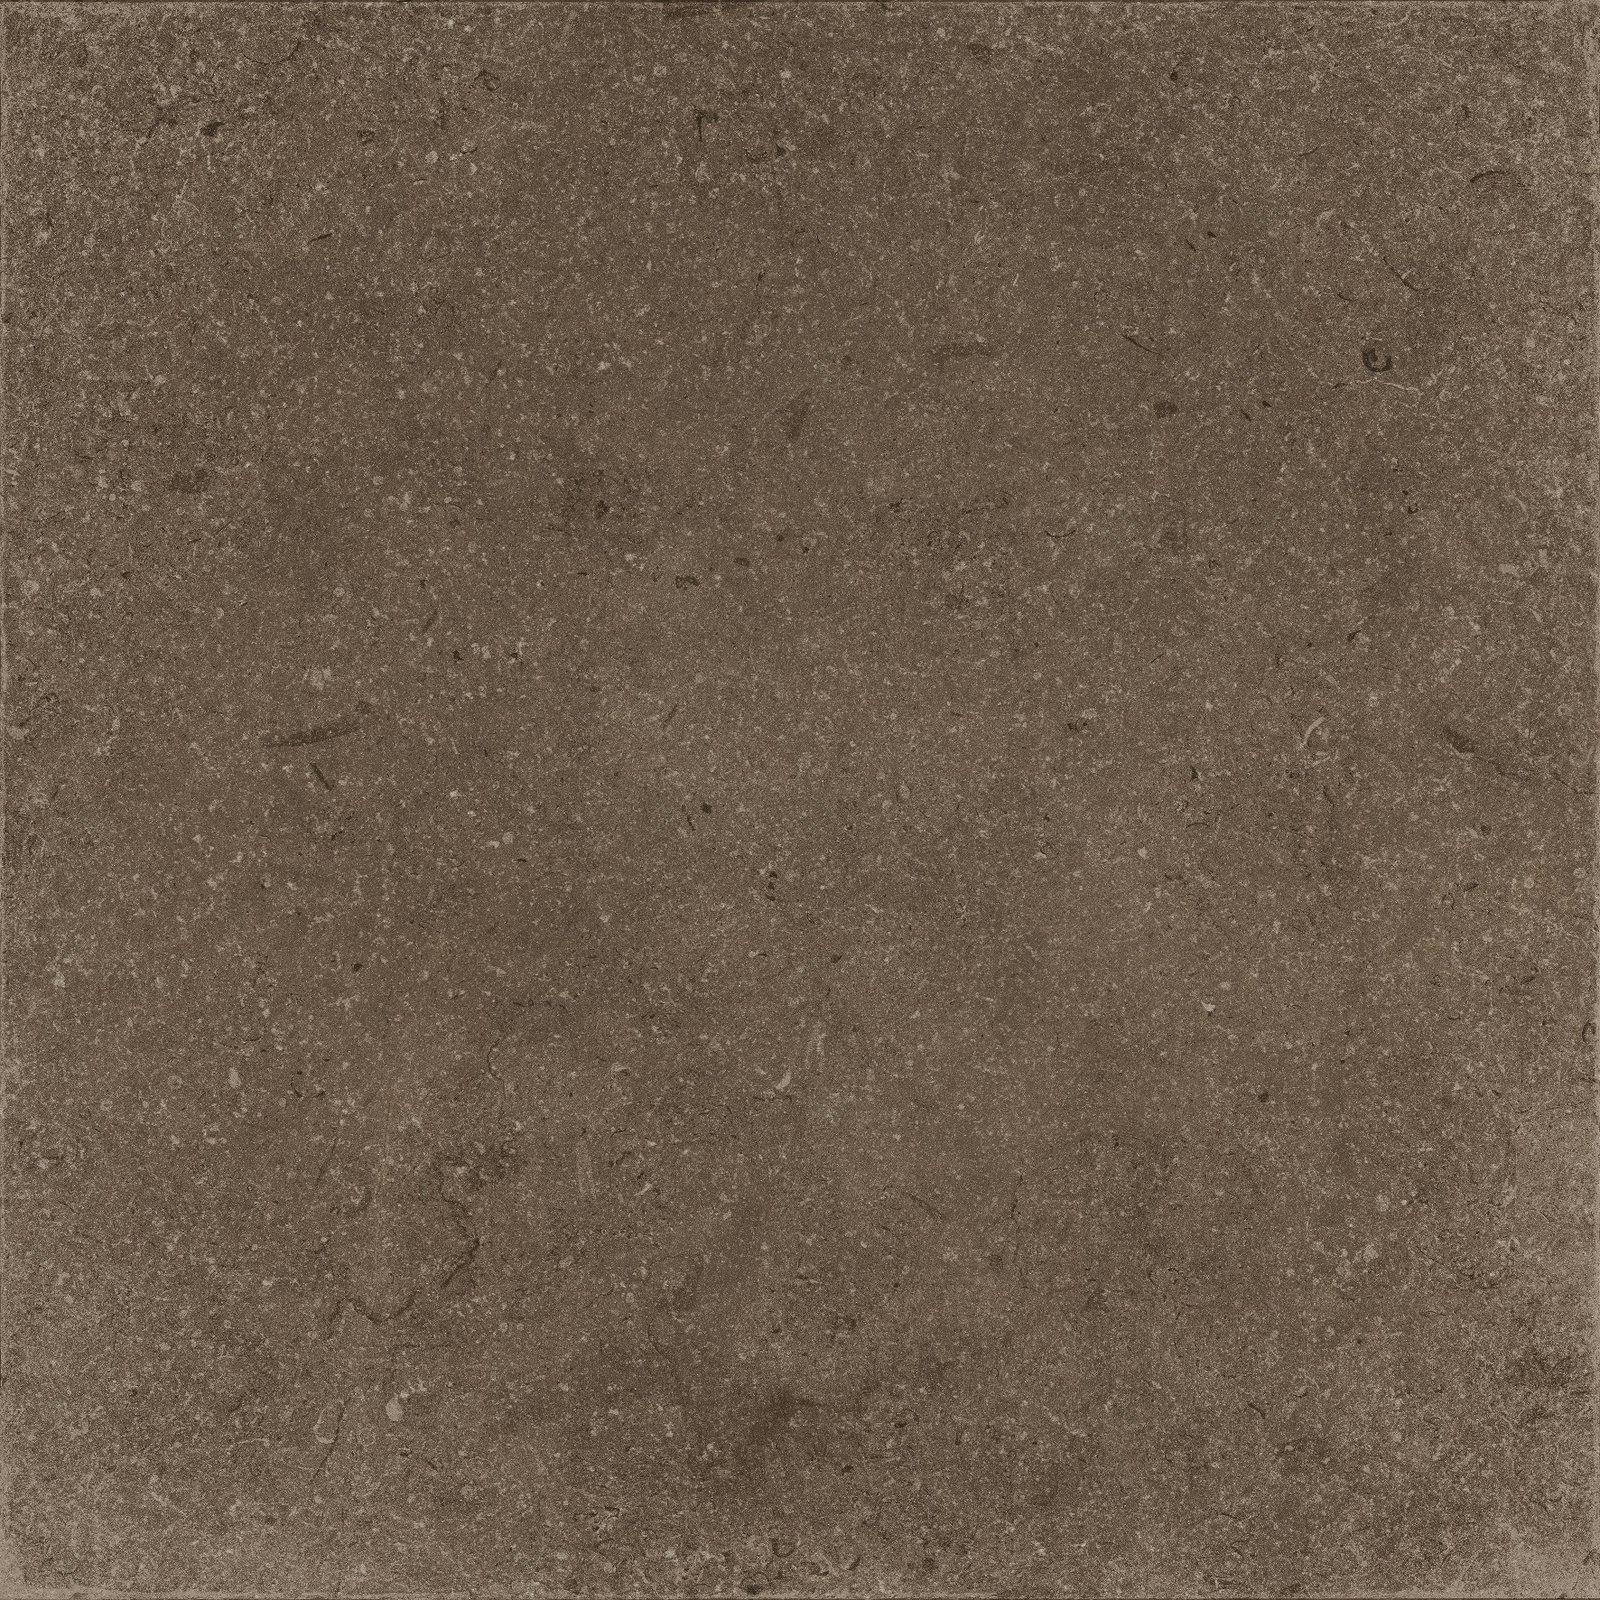 BROWN (X60NF6R) изображение 1